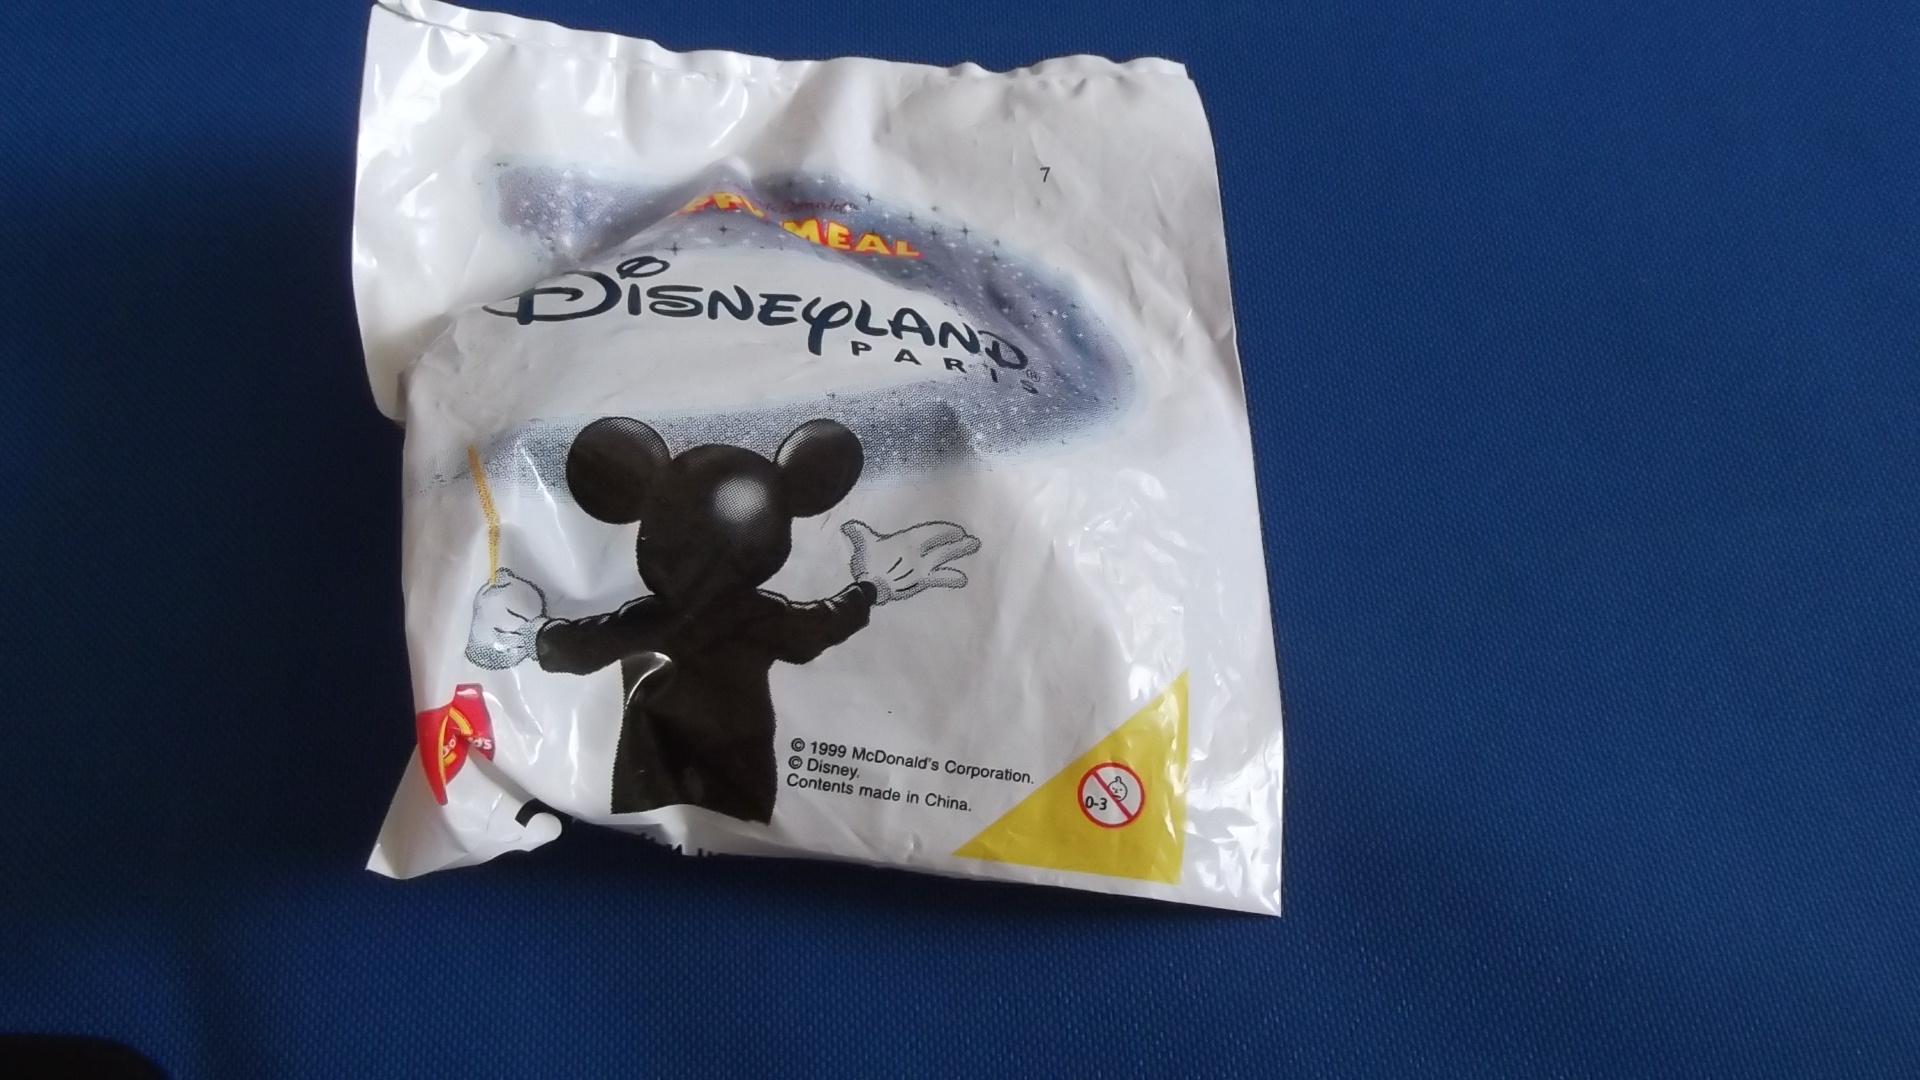 McDonalds Disneyland Paris Train #7 Toy From 1999 New